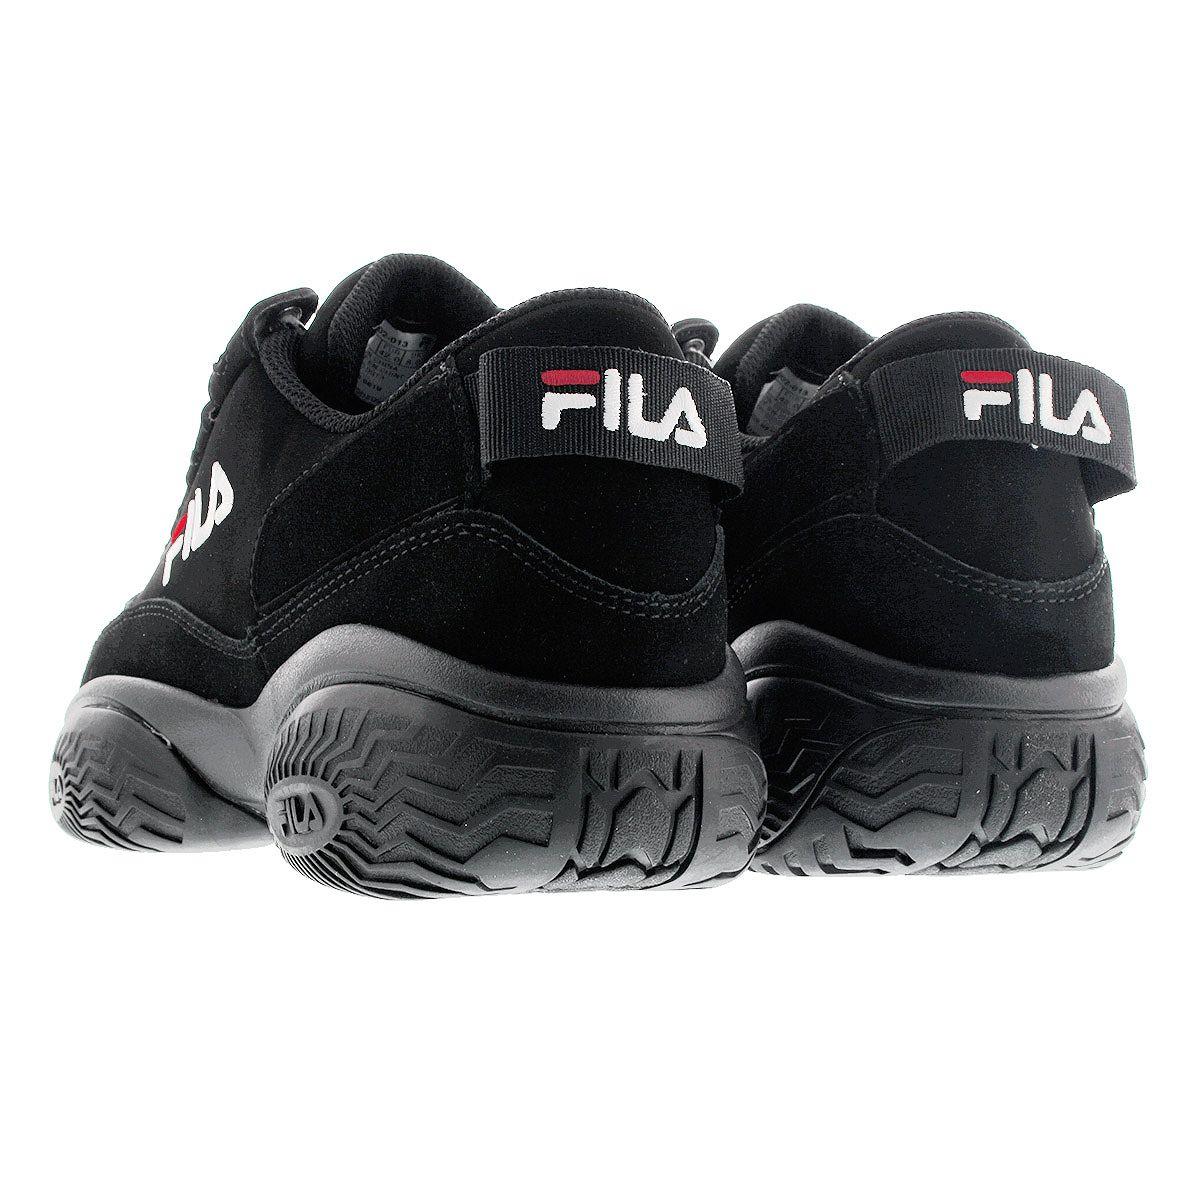 FILA PROVENANCE LOW フィラプロヴィナンスロウ BLACKWHITE f0400 0013